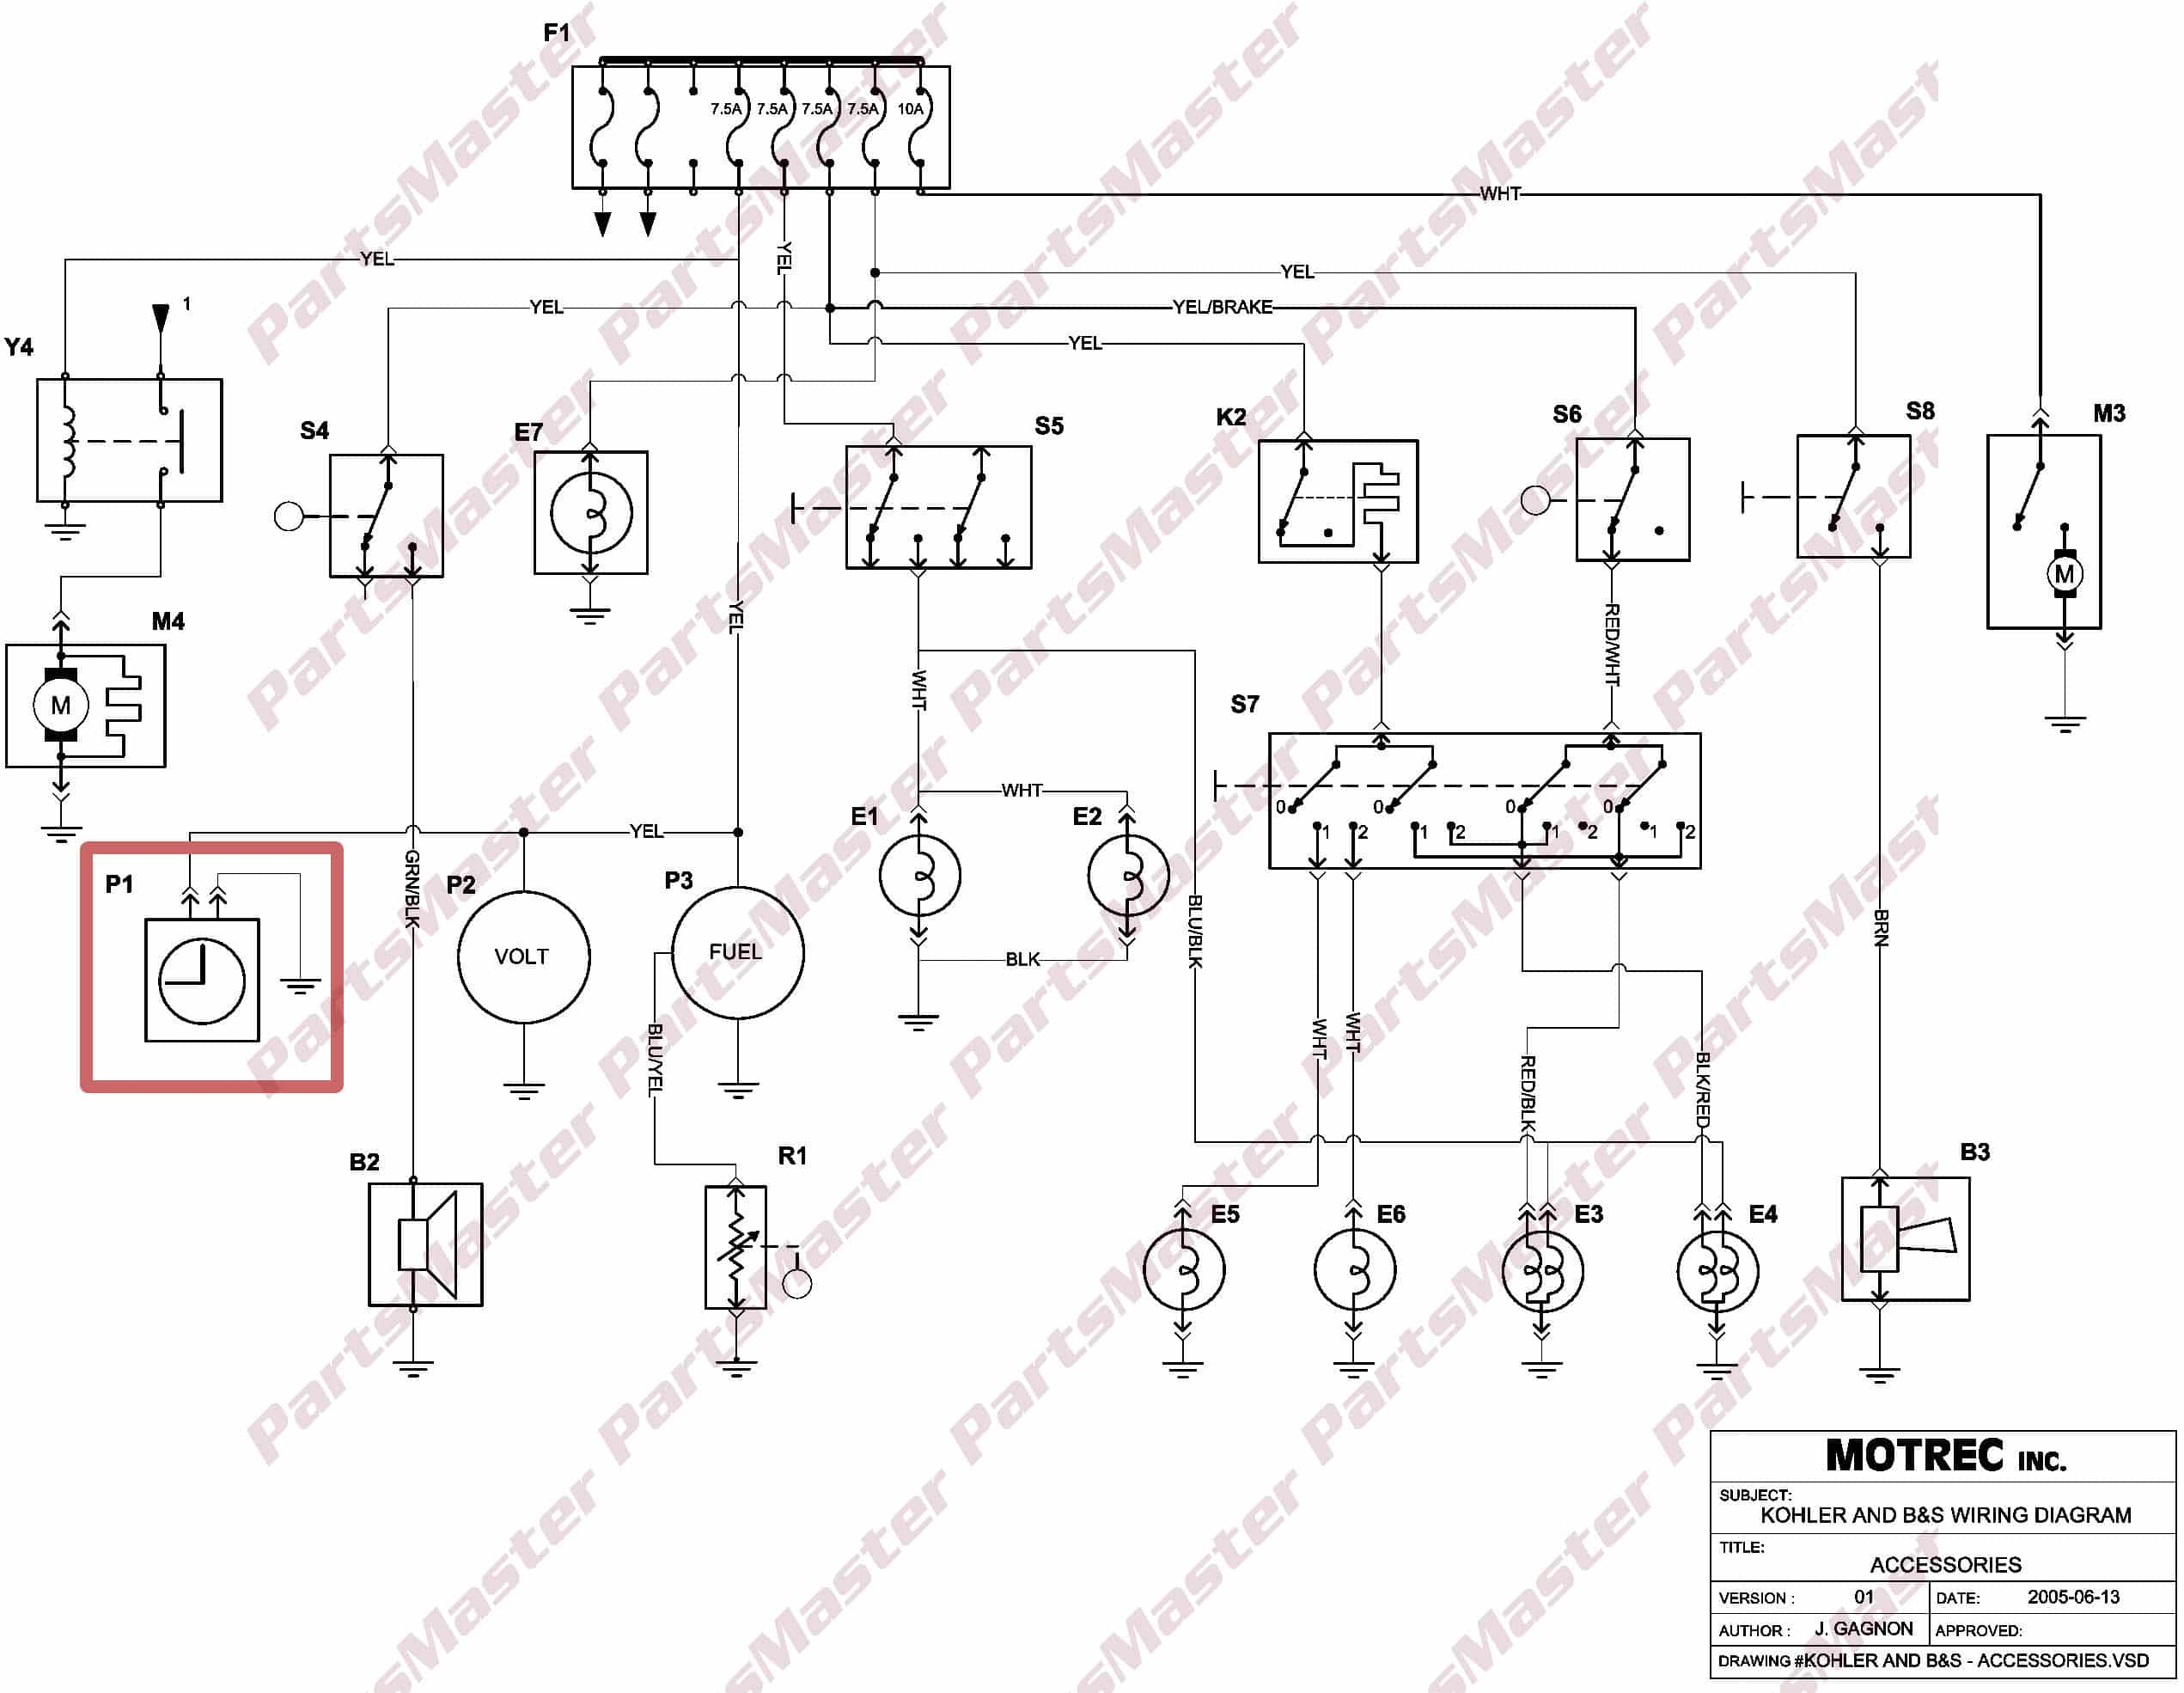 1994 Bluebird Wiring Diagram Library. S14 Wiring Diagram Cab Circuit \u2022 Club Car Bluebird Diagrams. Wiring. Blue Bird Wiring Diagram 2002 At Scoala.co